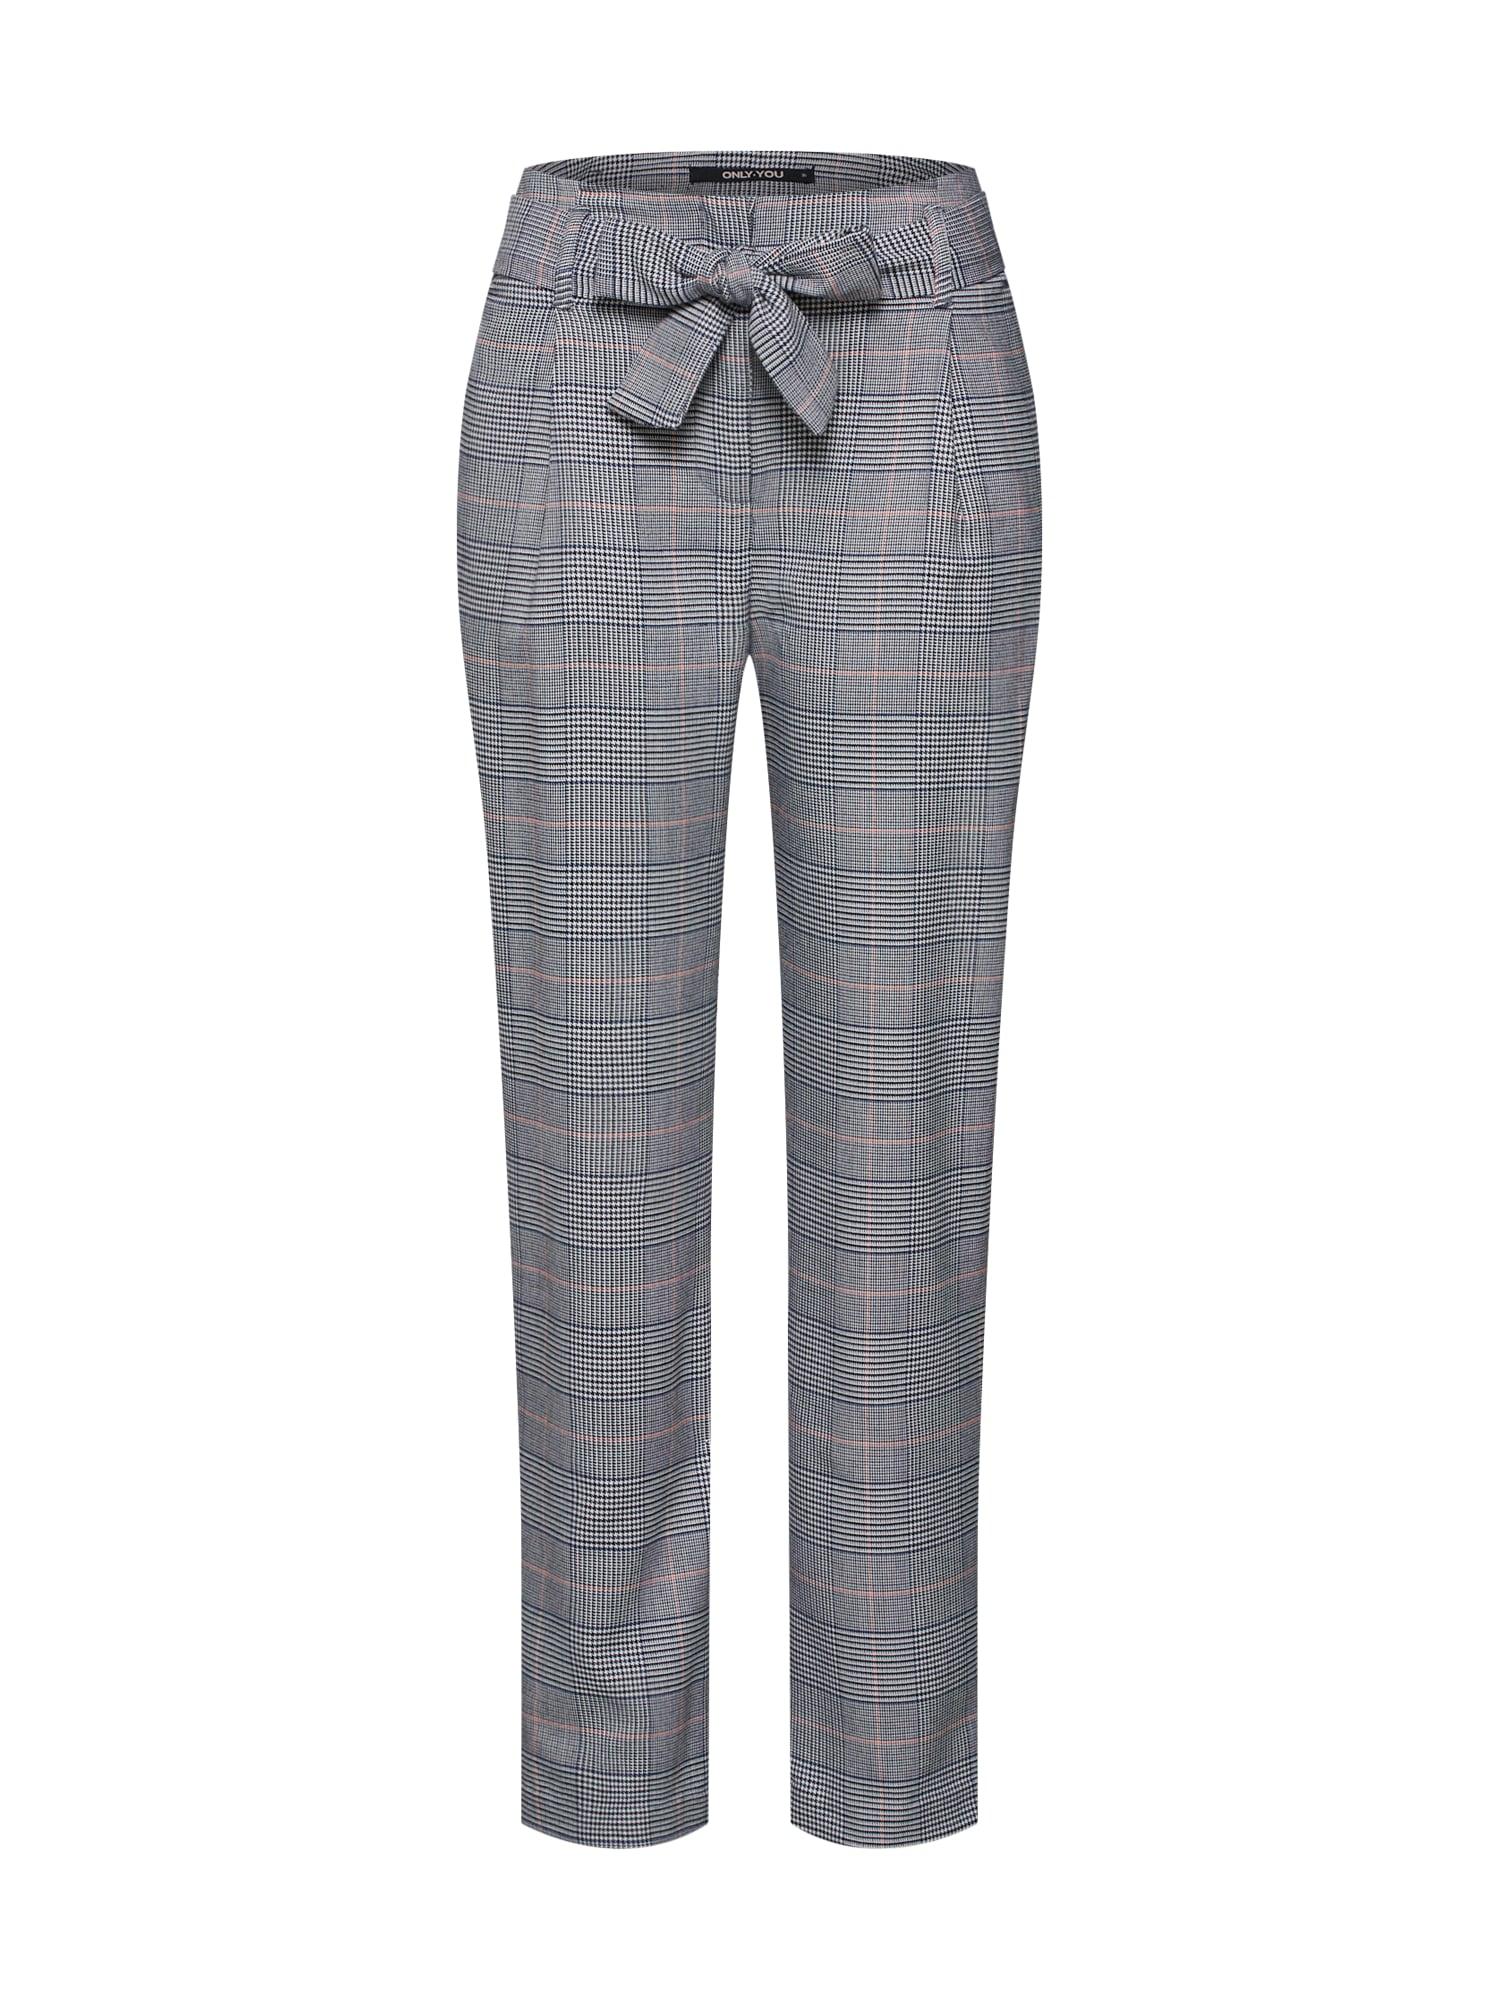 Kalhoty se sklady v pase onySOPHIE CHECK HW PAPERBAG šedá ONLY